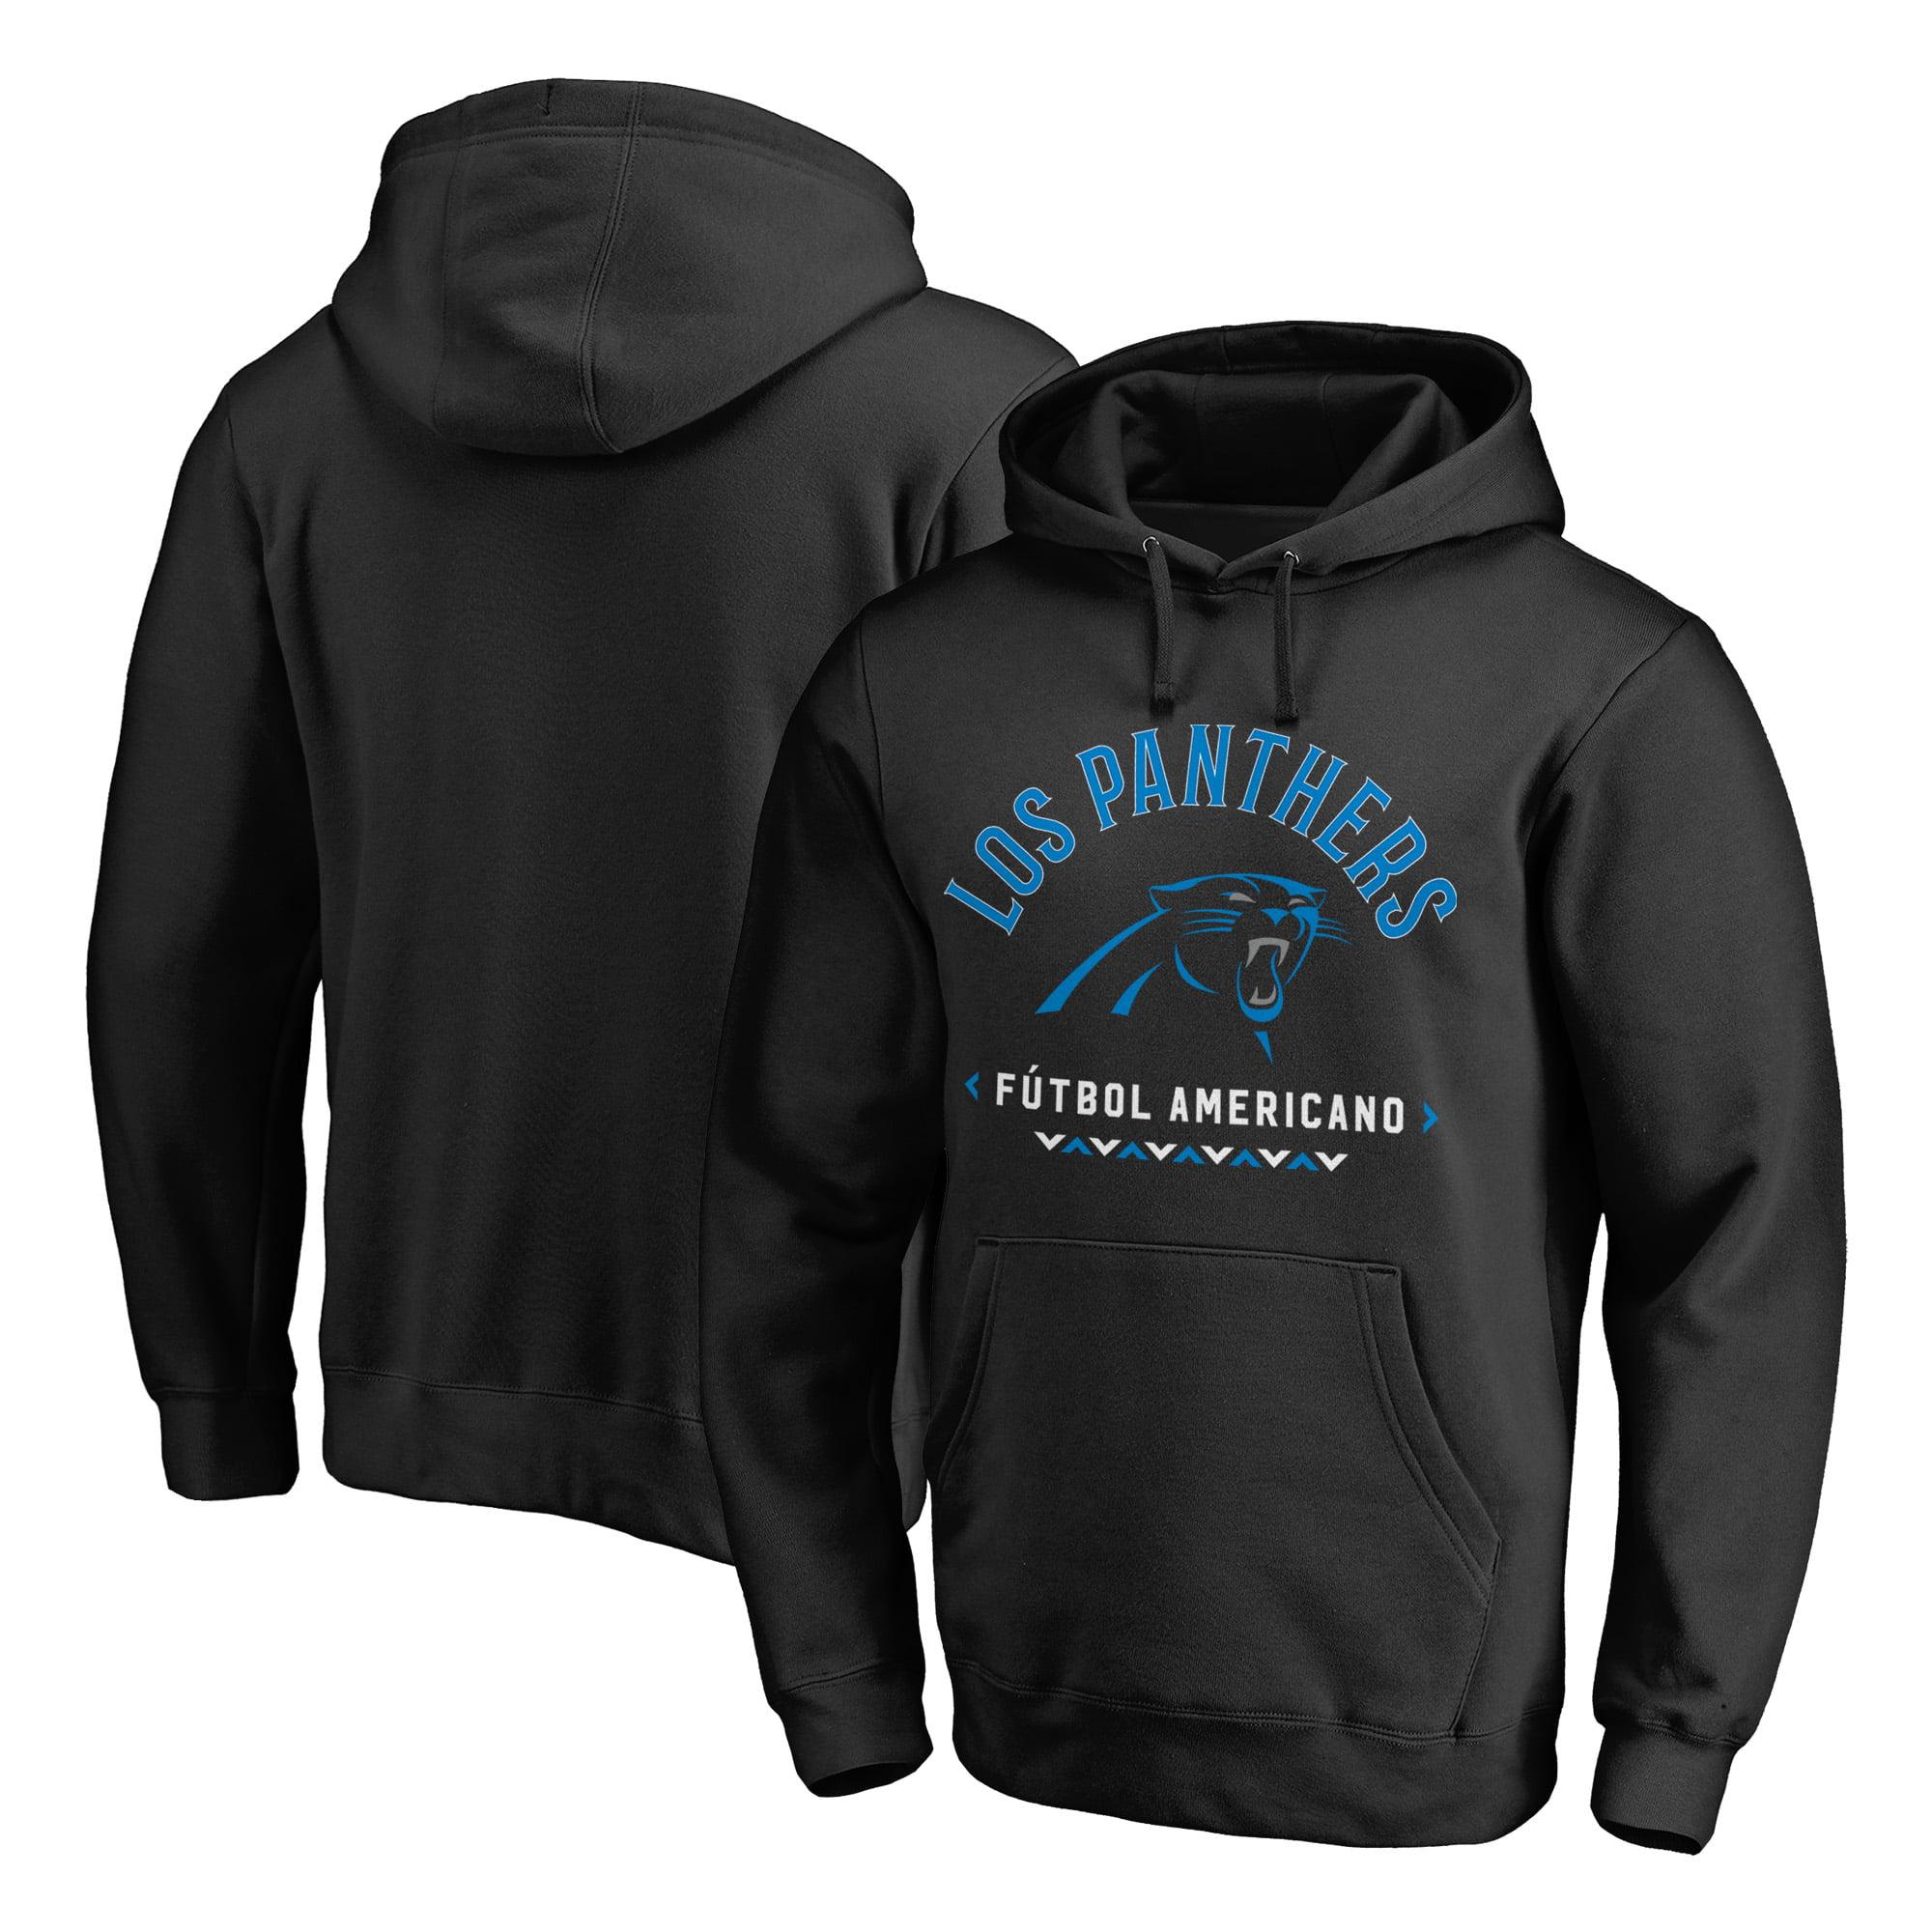 Carolina Panthers NFL Pro Line by Fanatics Branded Futbol Americano Pullover Hoodie - Black